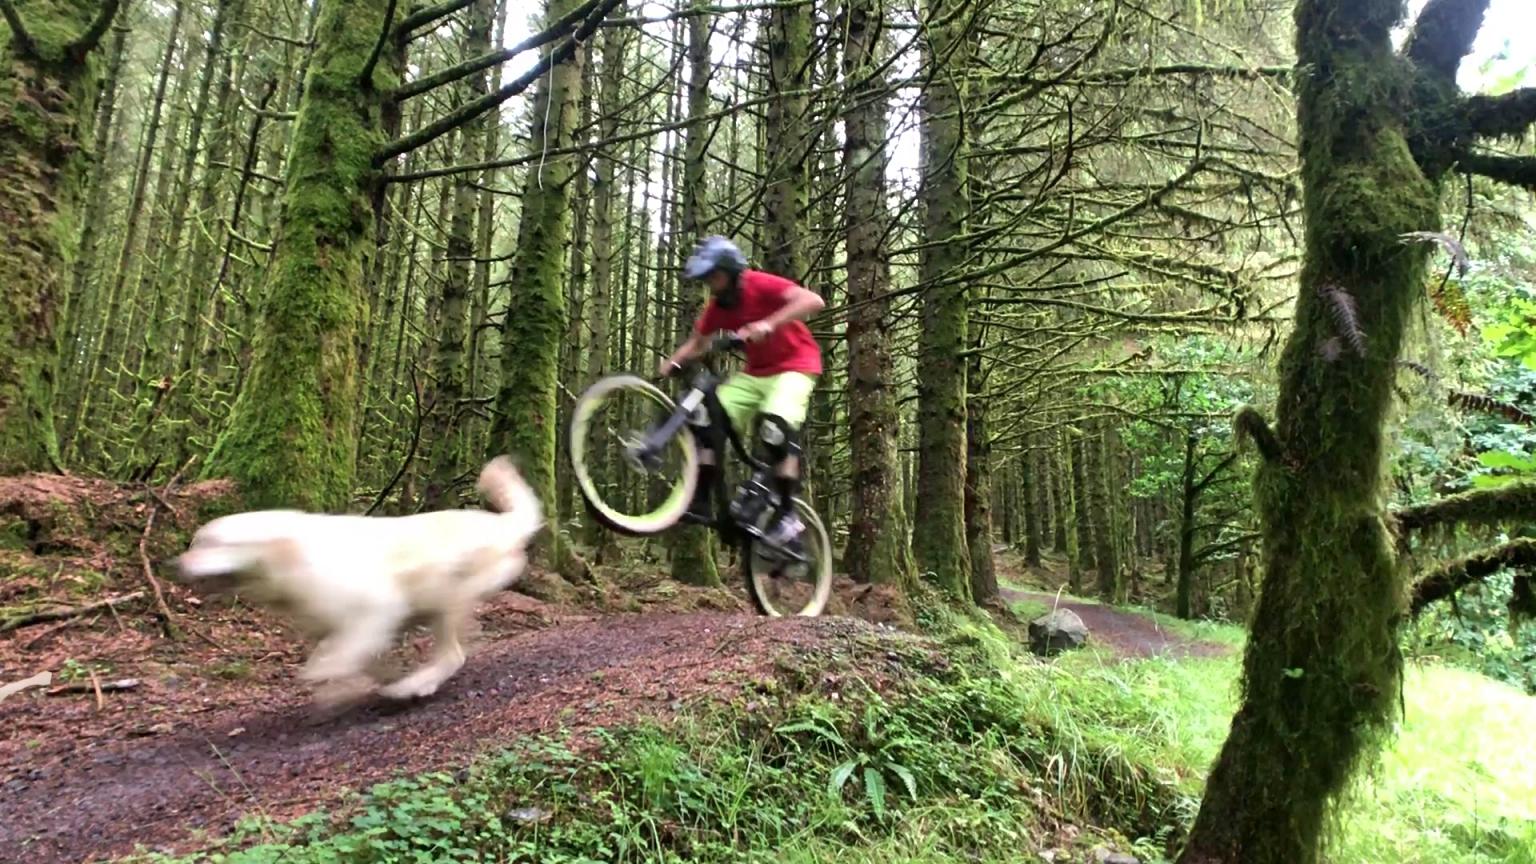 ni_explorer_davagh_forest_mountain_biking_northern_ireland (8).jpg